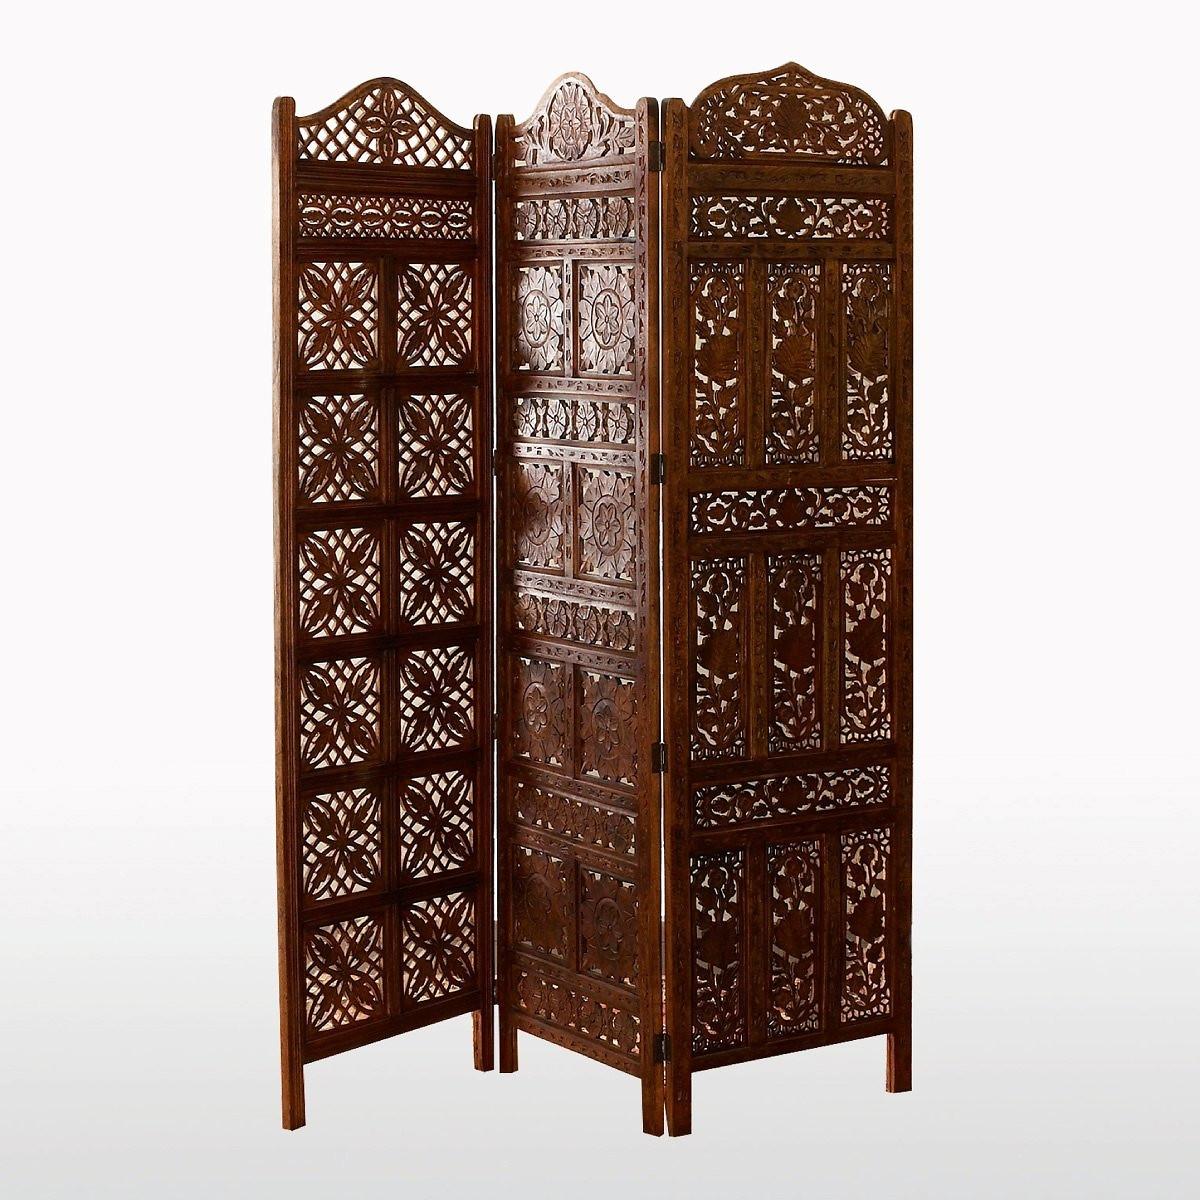 Ширма LaRedoute В стиле арабской решетки Aima единый размер бежевый